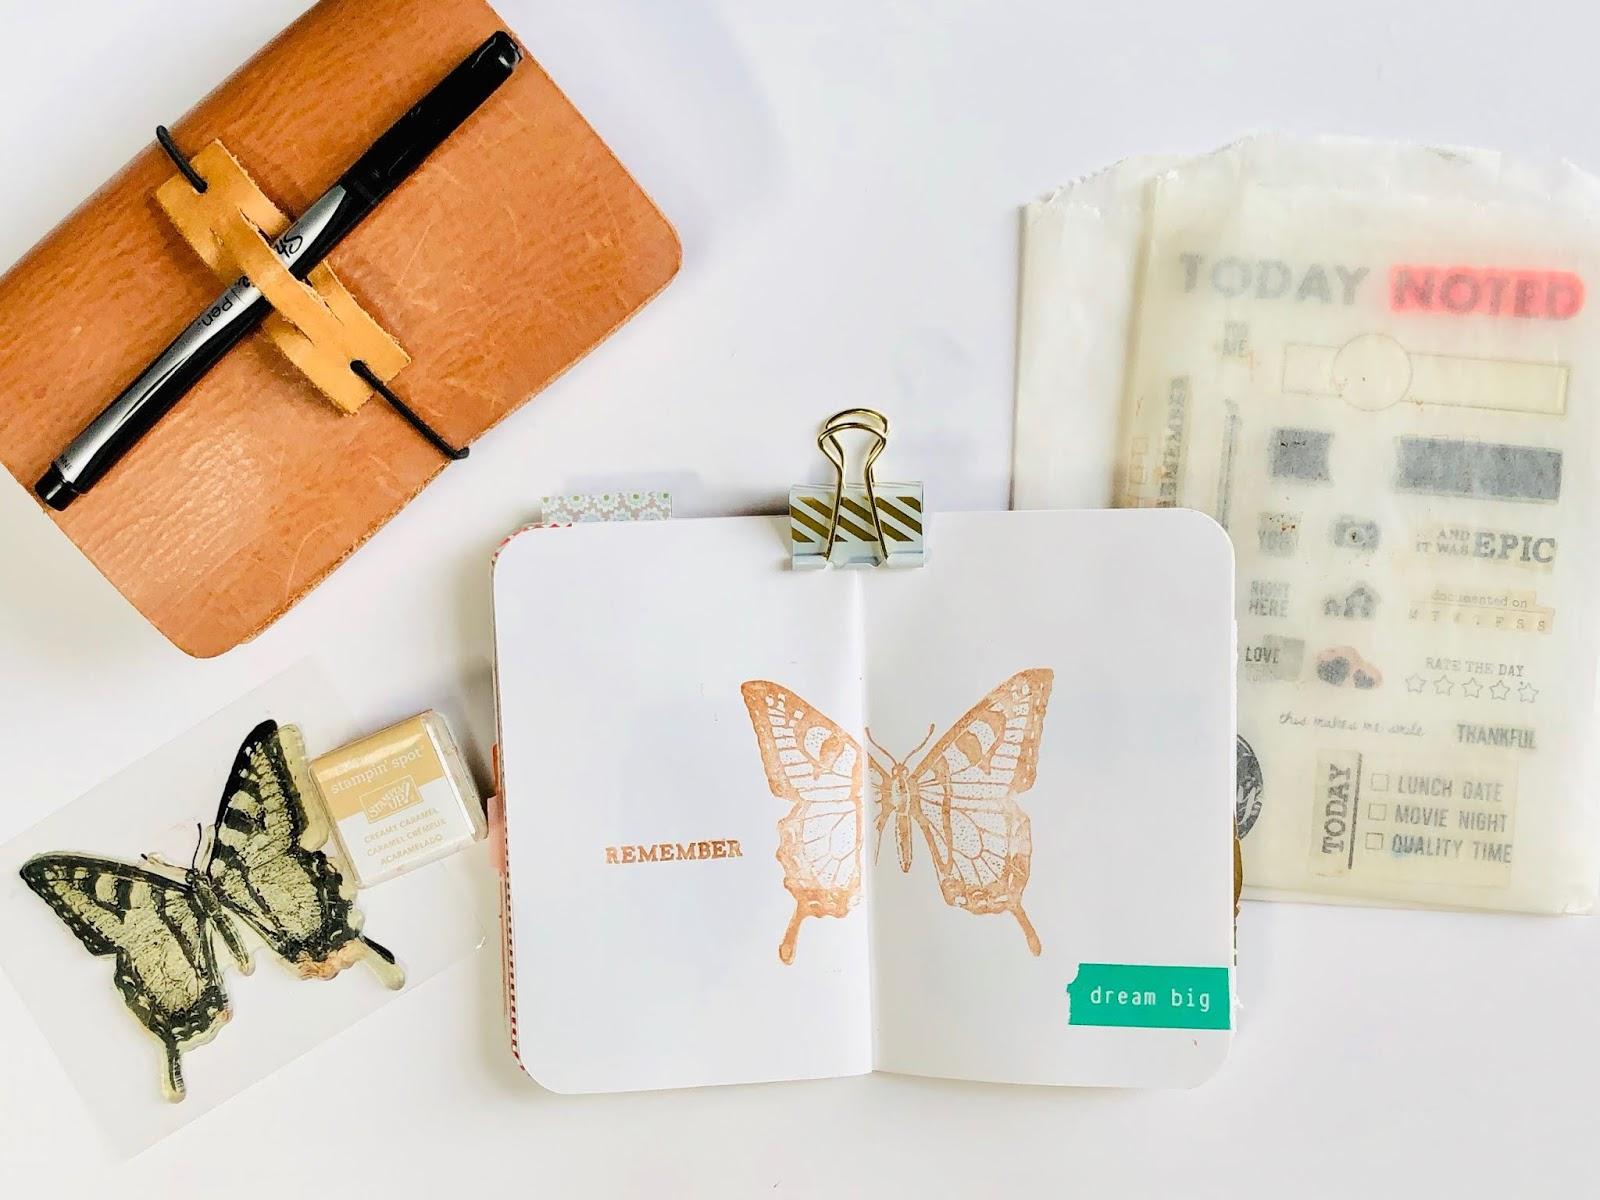 #stamping #Travelers Notebook #Gratitude Journal #journaling #Midori #Planner #notebook #thankfulness #gratitude #grateful #art journal #art journaling